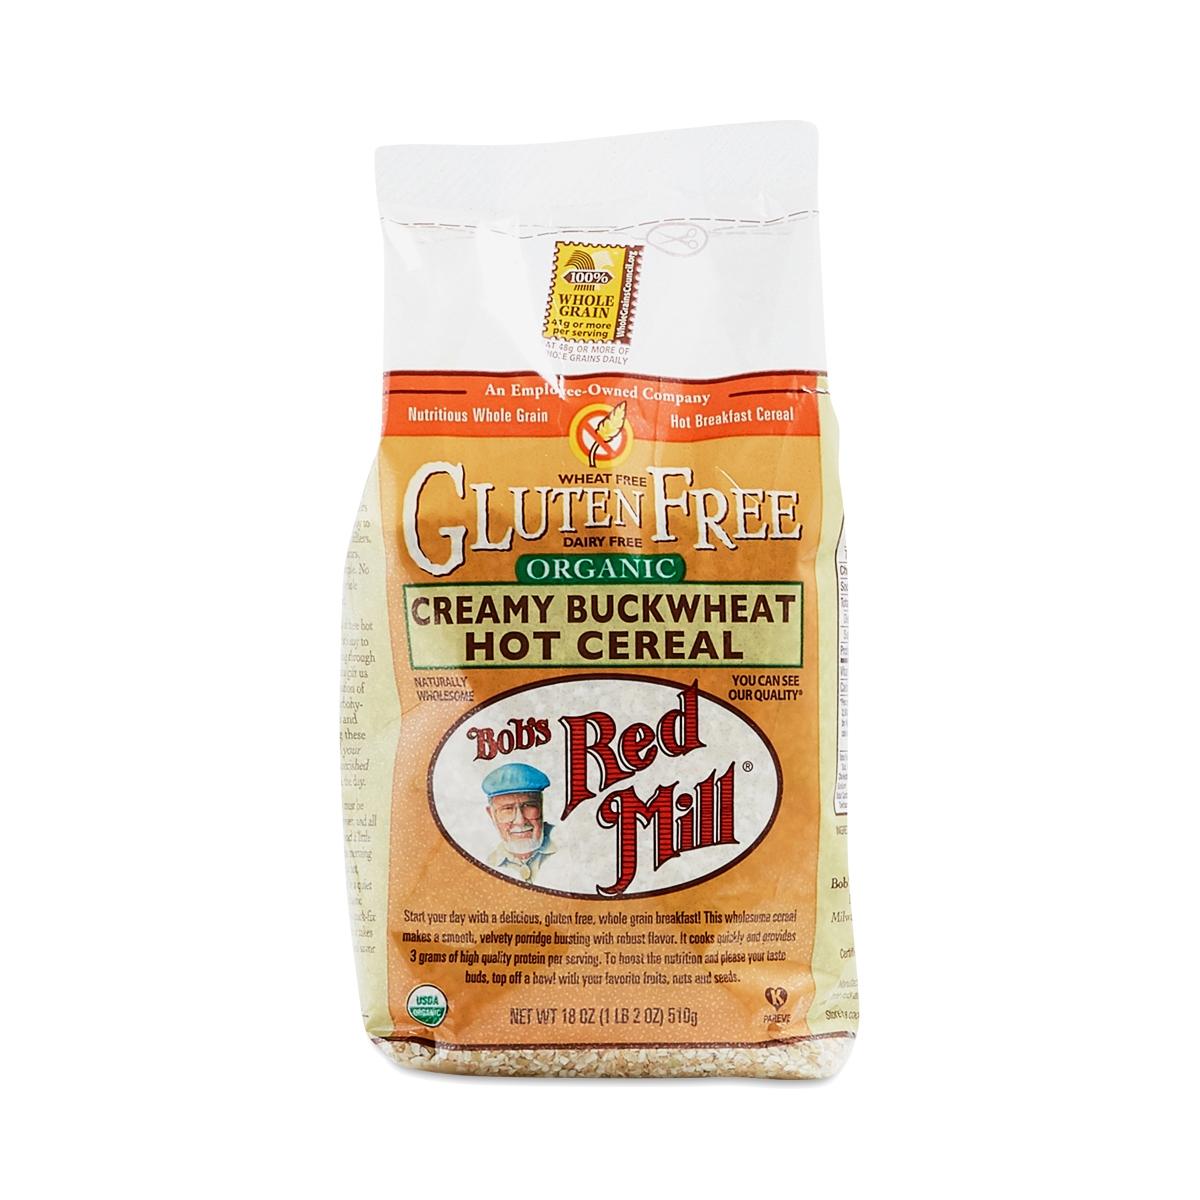 Bob's Red Mill Organic Creamy Buckwheat Hot Cereal 18 oz bag